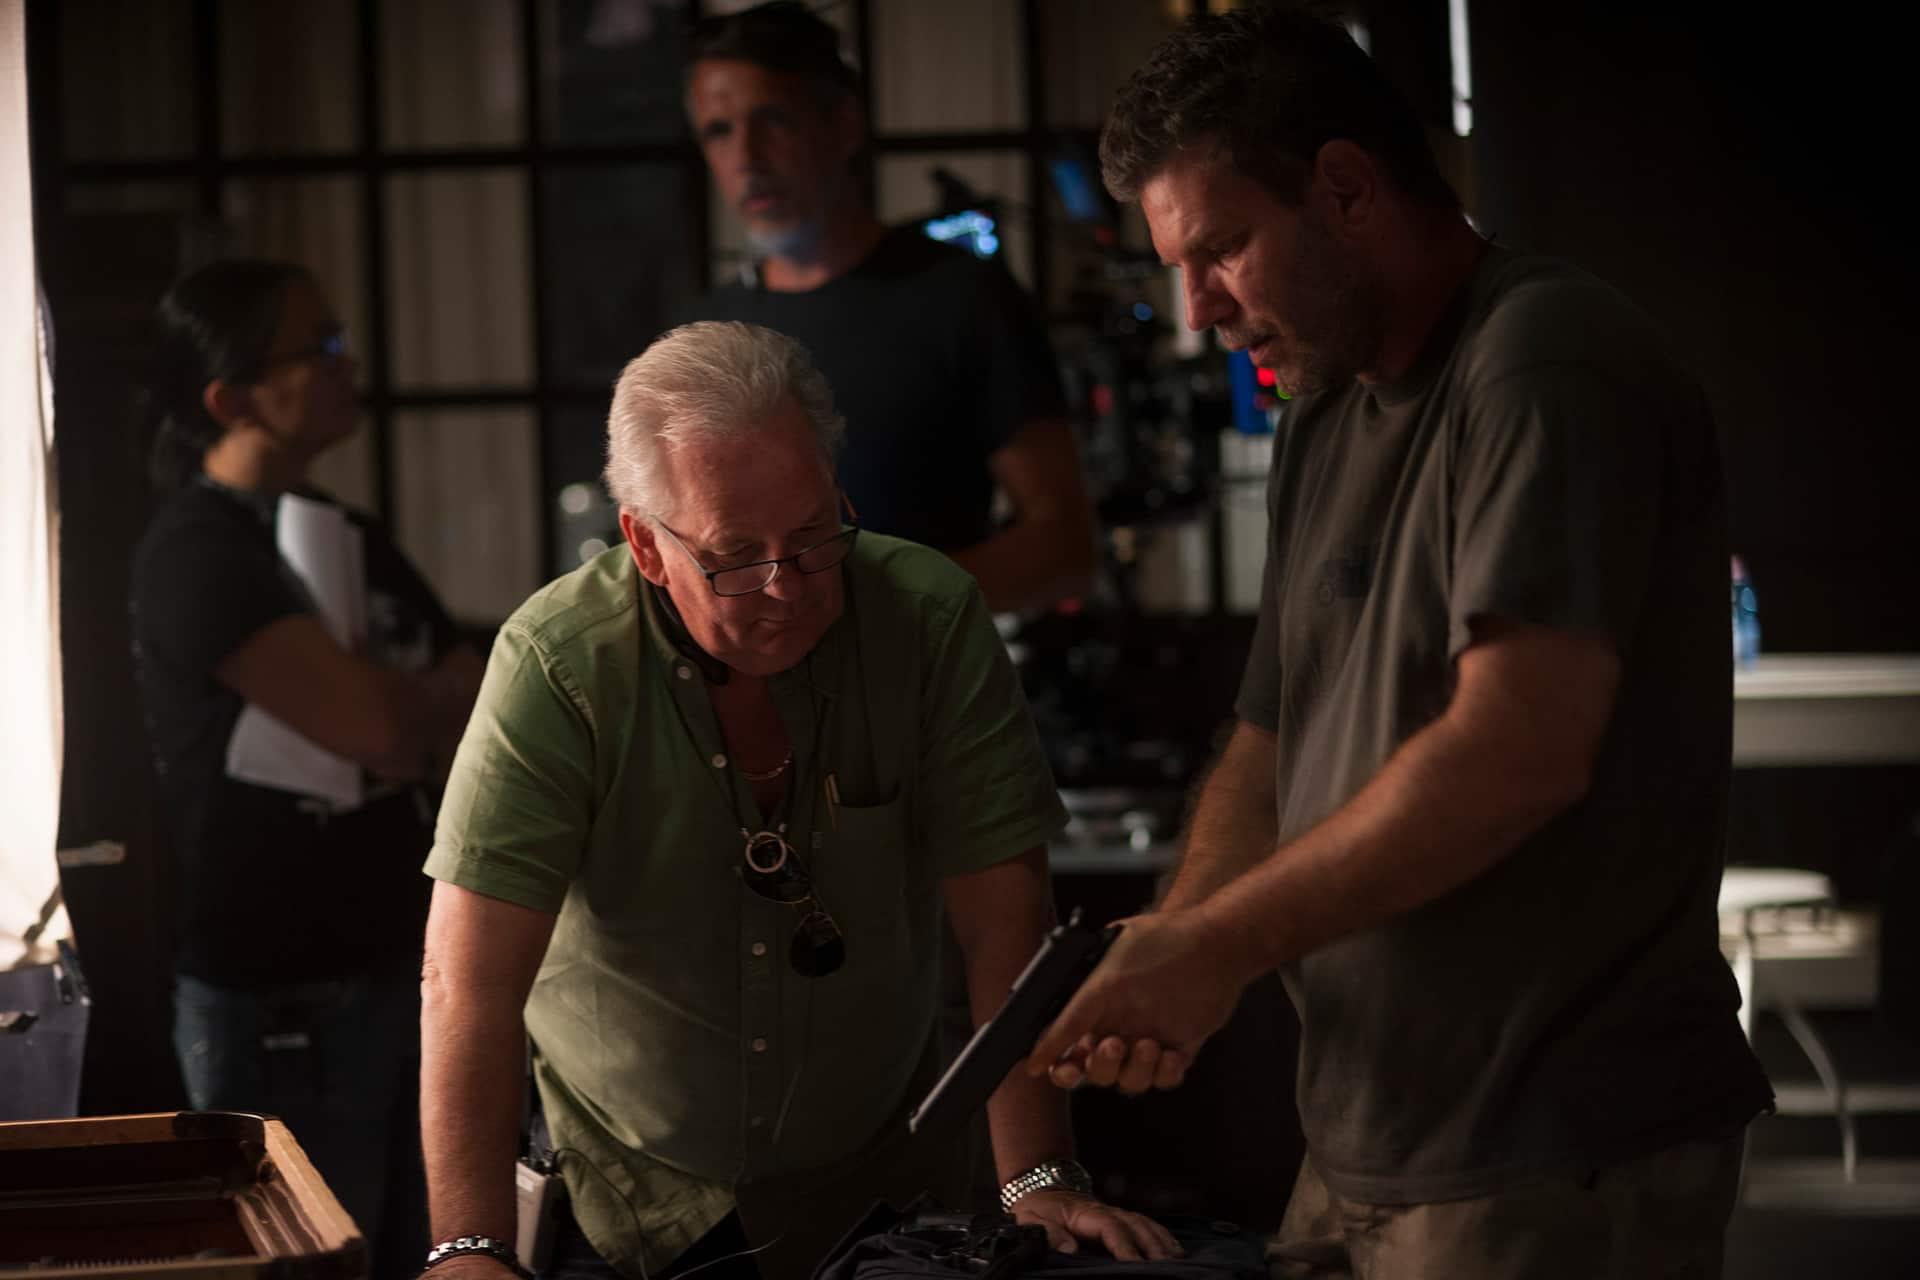 Producer John Calvert with Supervising Armourer Zoltán Bus on the set of X Company Season 3.